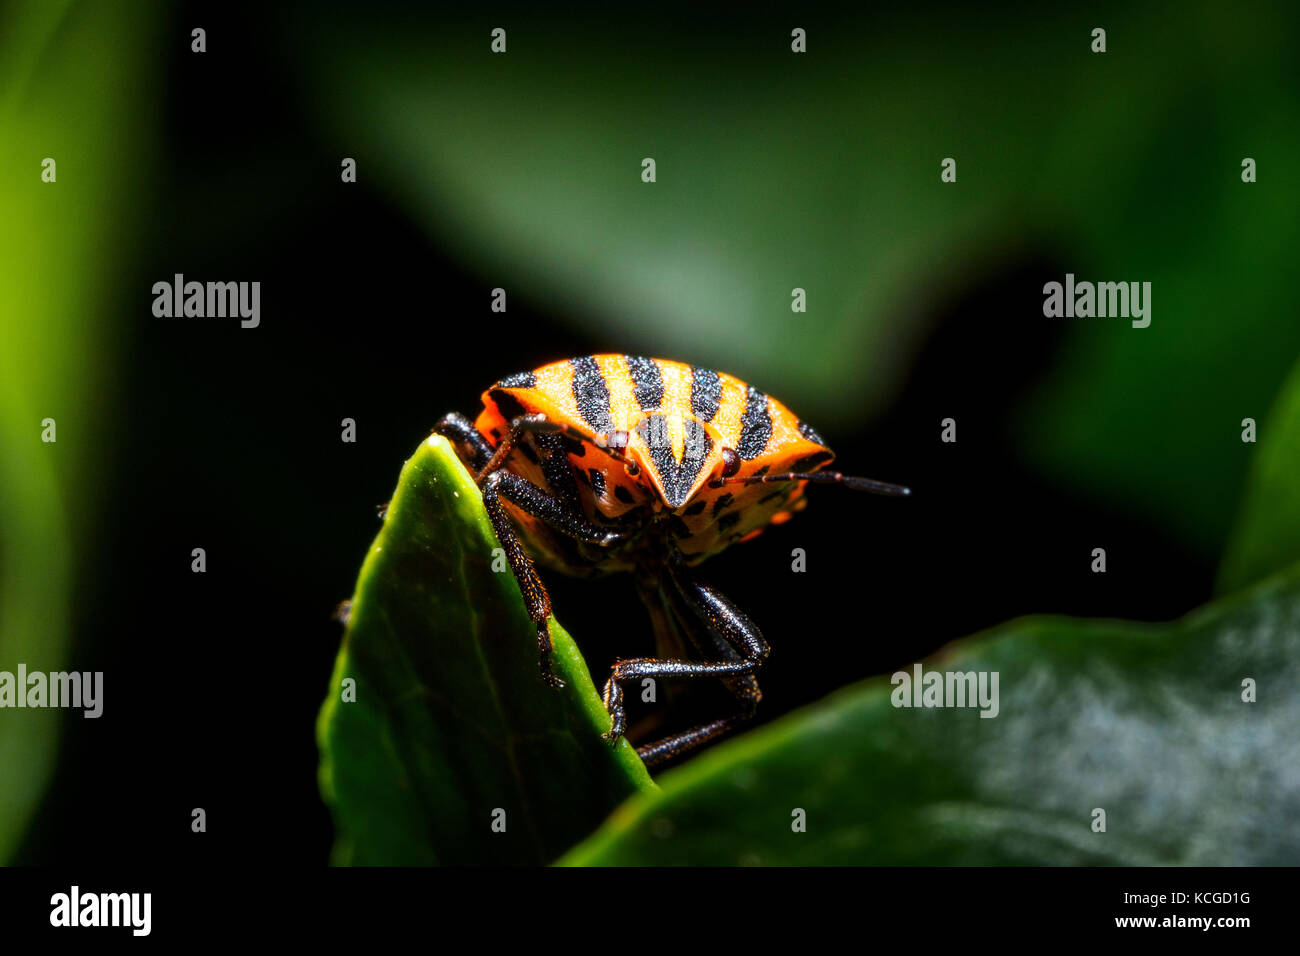 Italian striped-bug / Minstrel bug / Harlequin bug (Graphosoma lineatum / Graphosoma italicum) Stock Photo